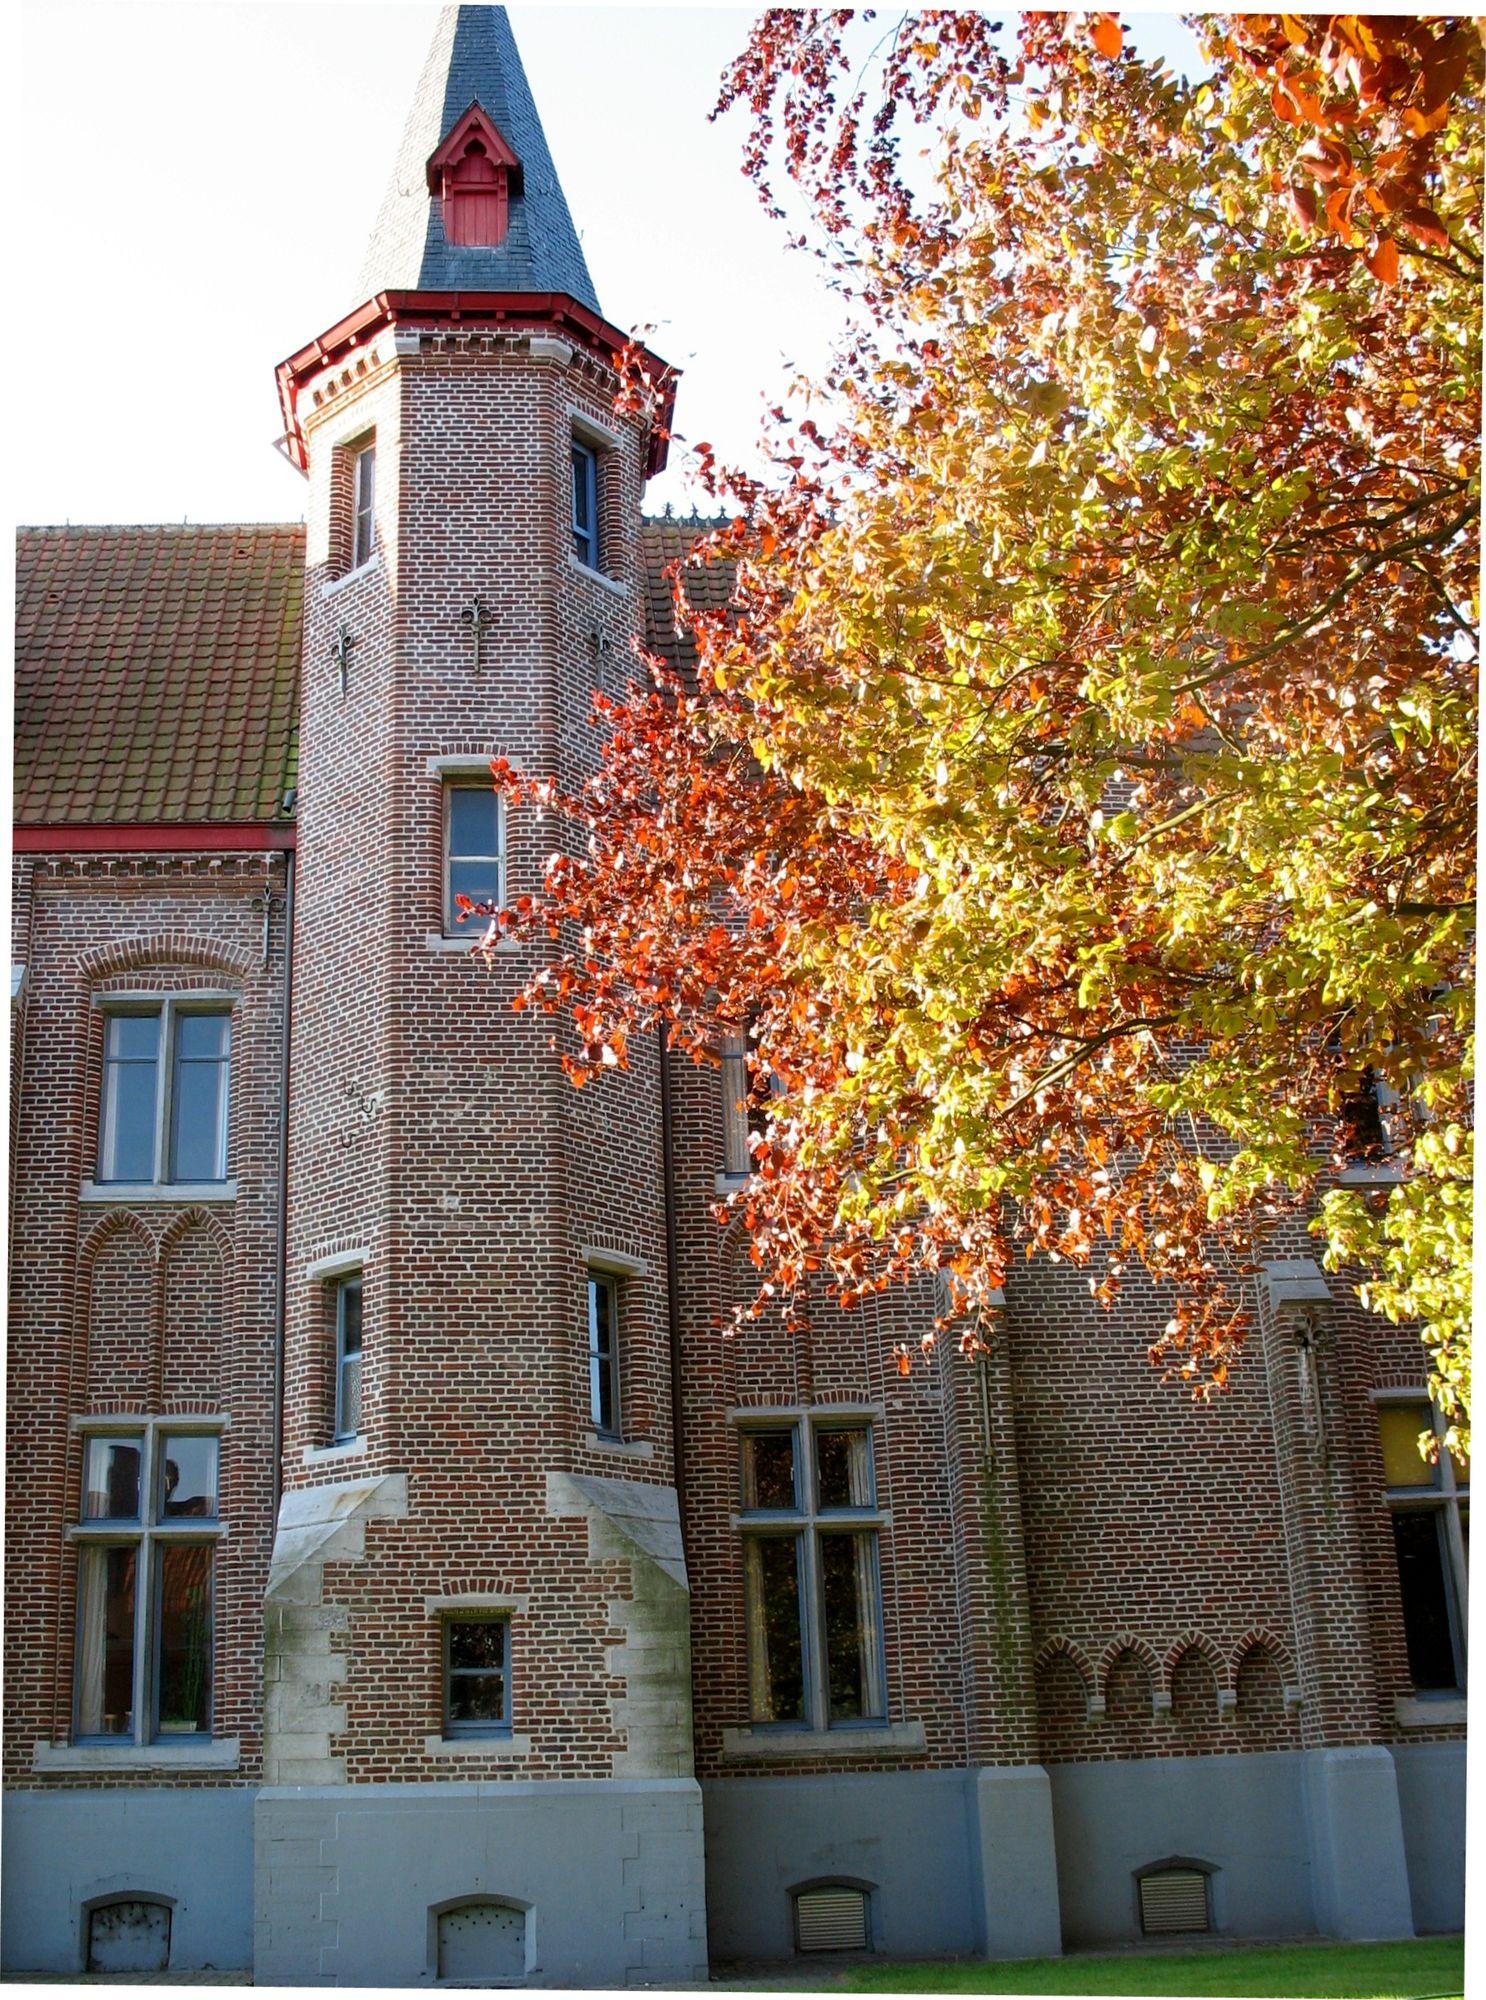 reginagodshuis (2).jpg